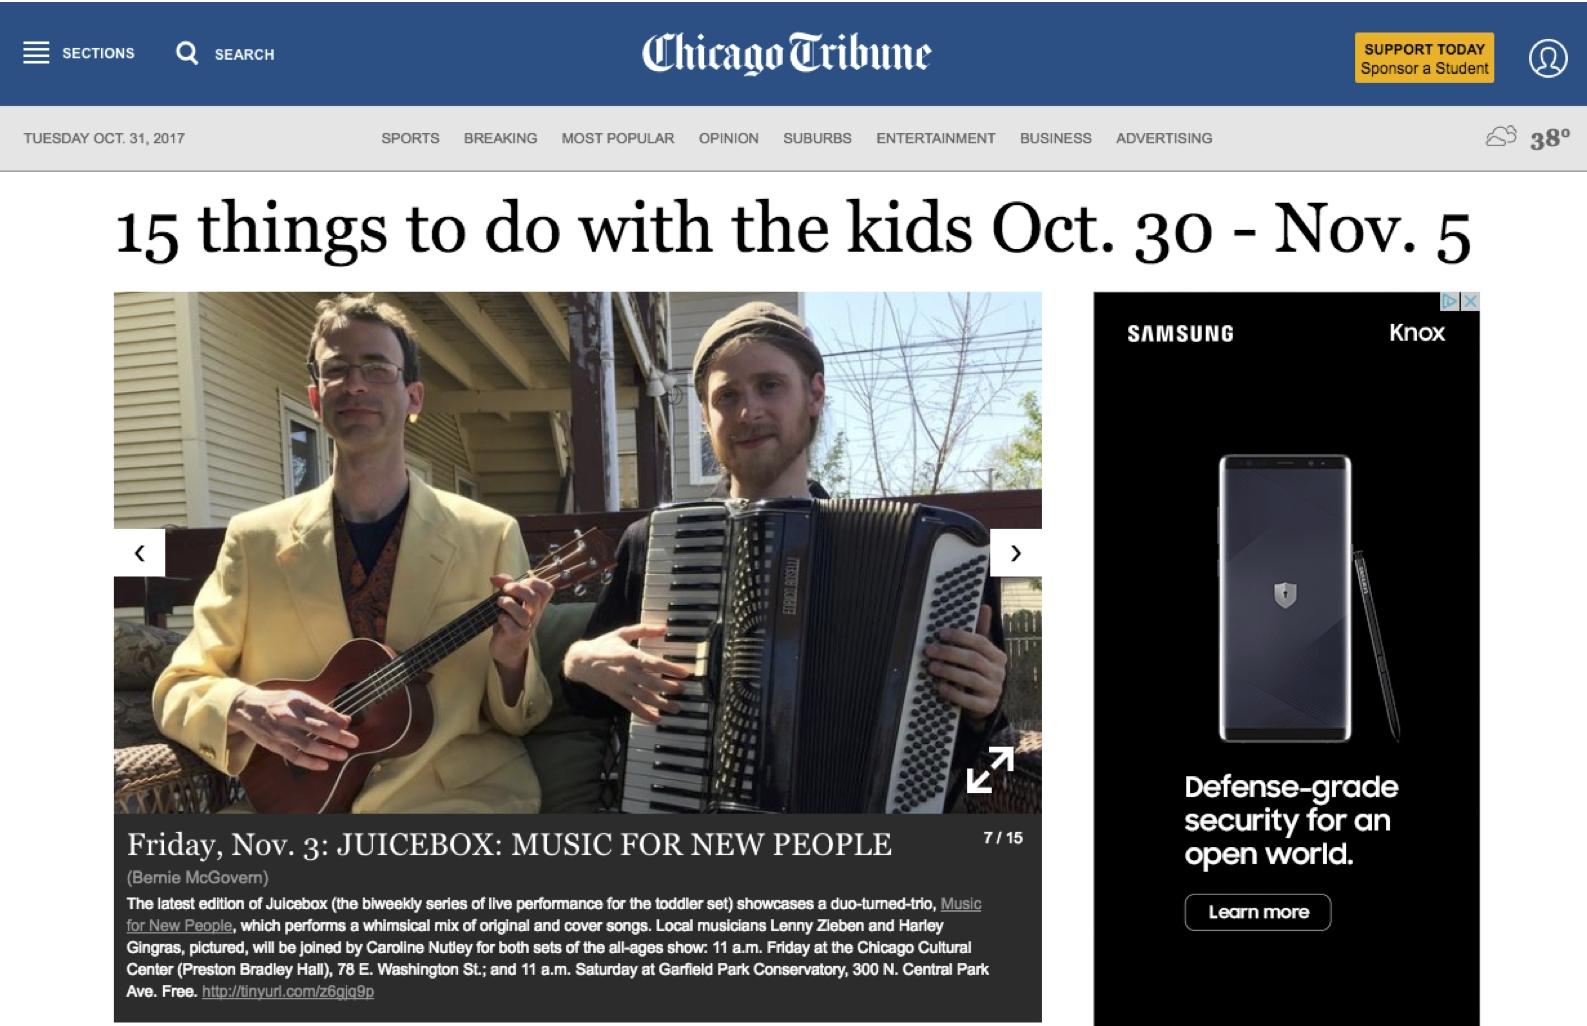 MFNP Juicebox Tribune.jpg